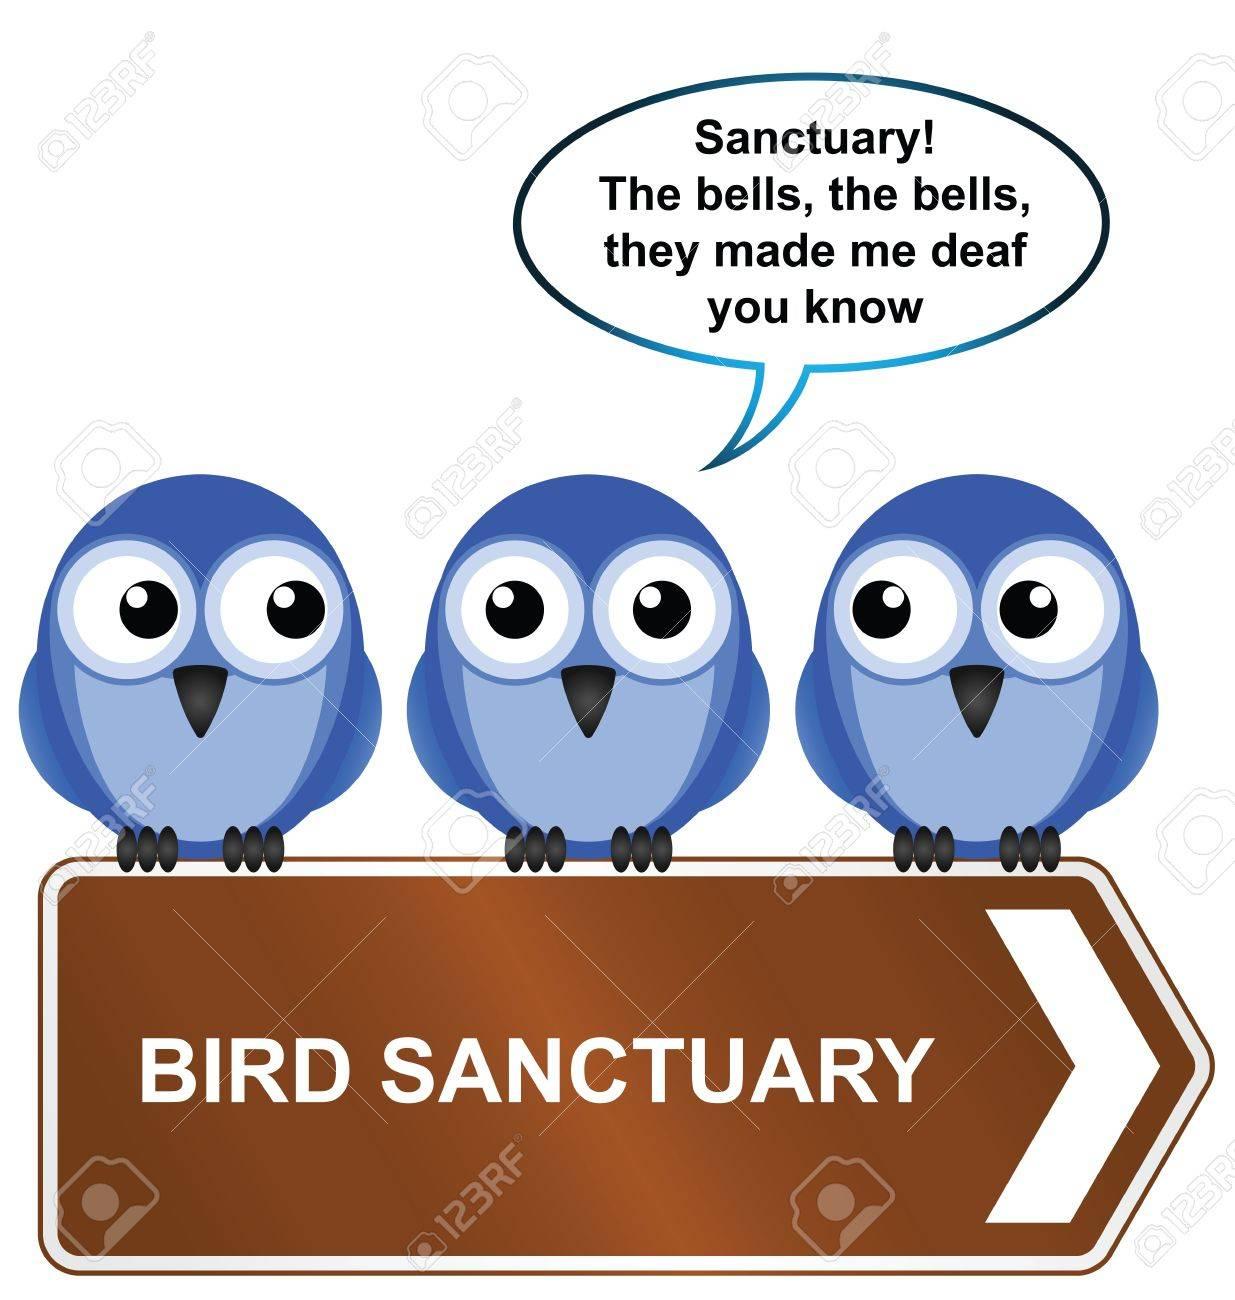 Bird impersonating Quasimodo requesting sanctuary isolated on white background Stock Vector - 12197136